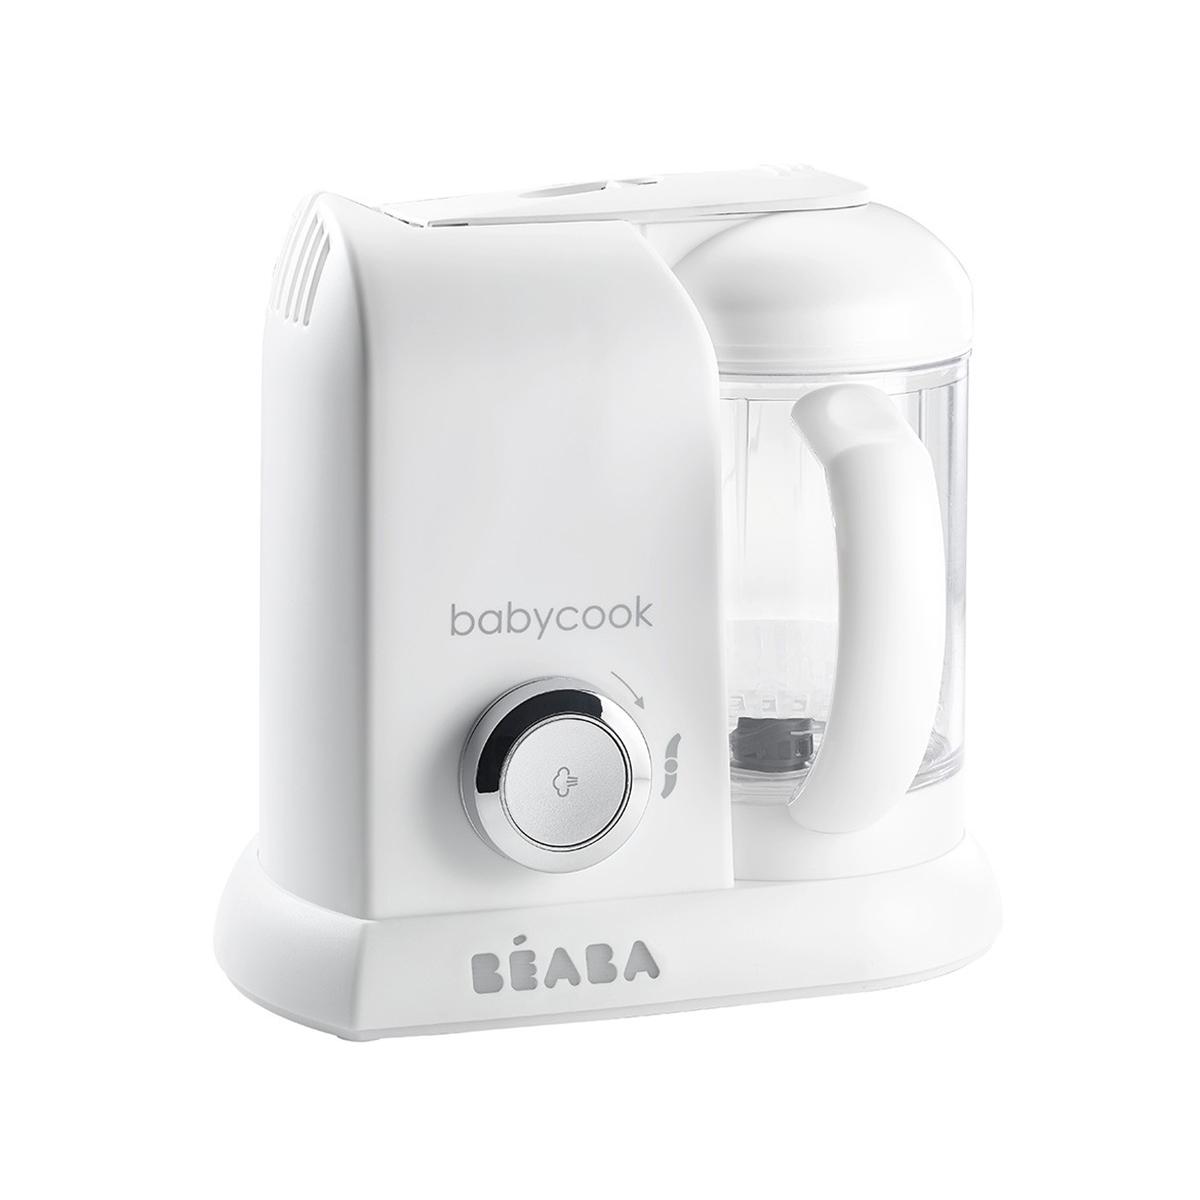 Cuiseur & Mixeur Babycook Blanc Robot cuiseur mixeur Babycook Blanc